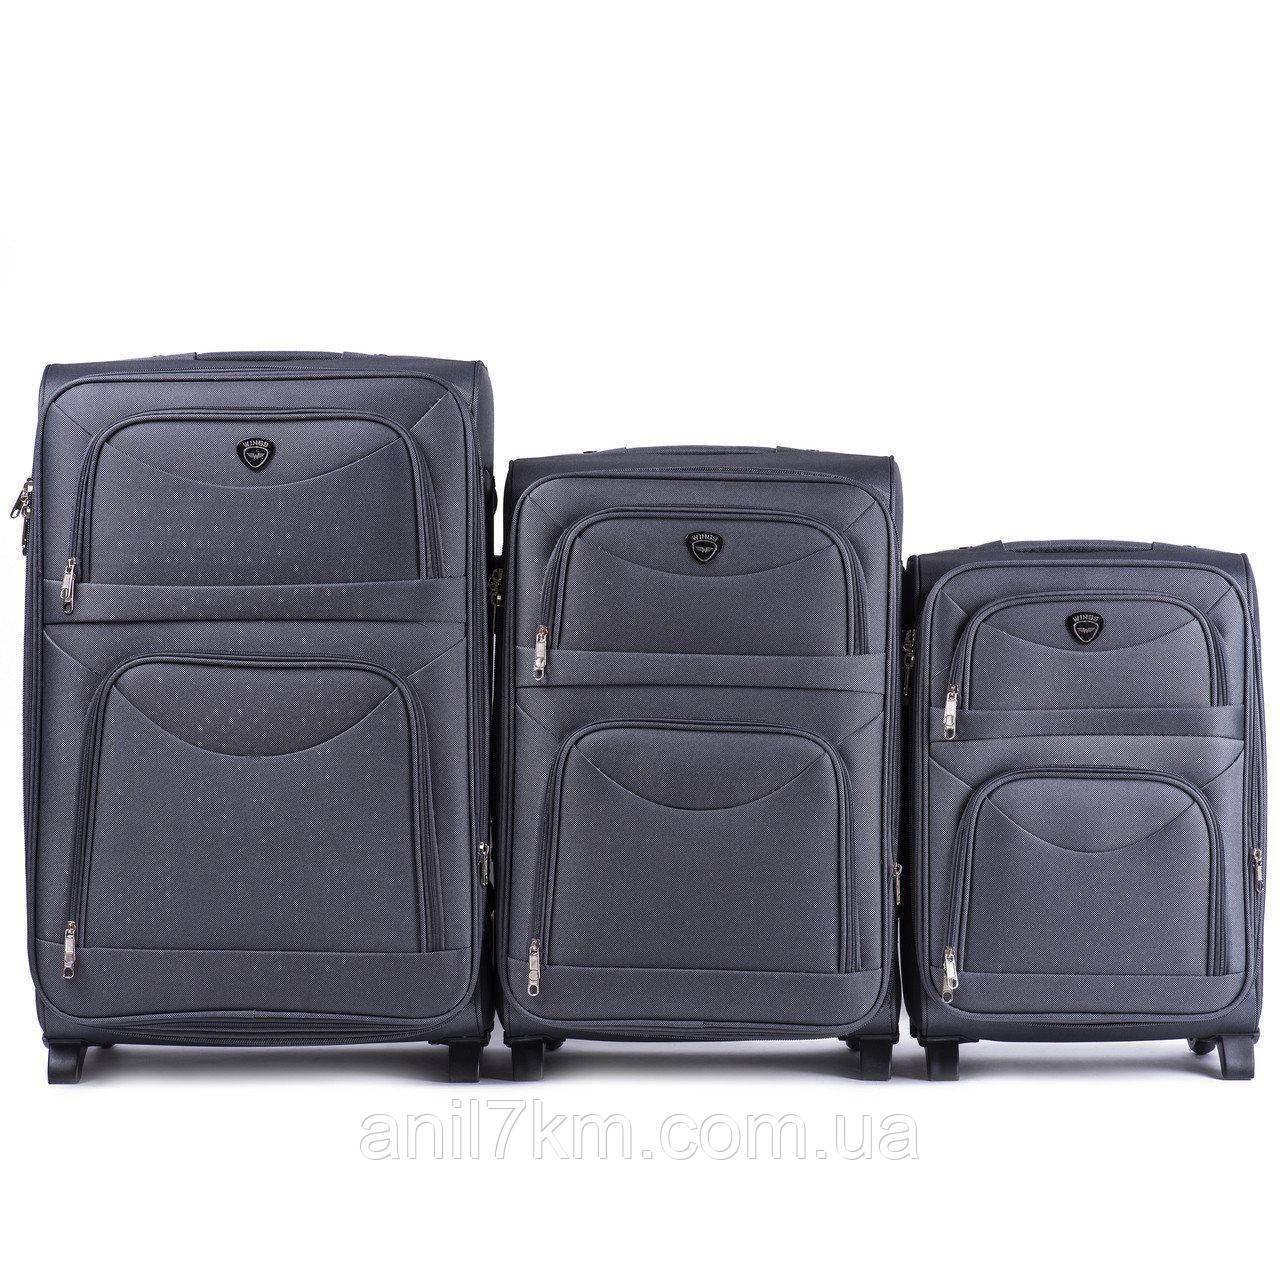 Комплект чемоданов 3-ка.на колёсах wings